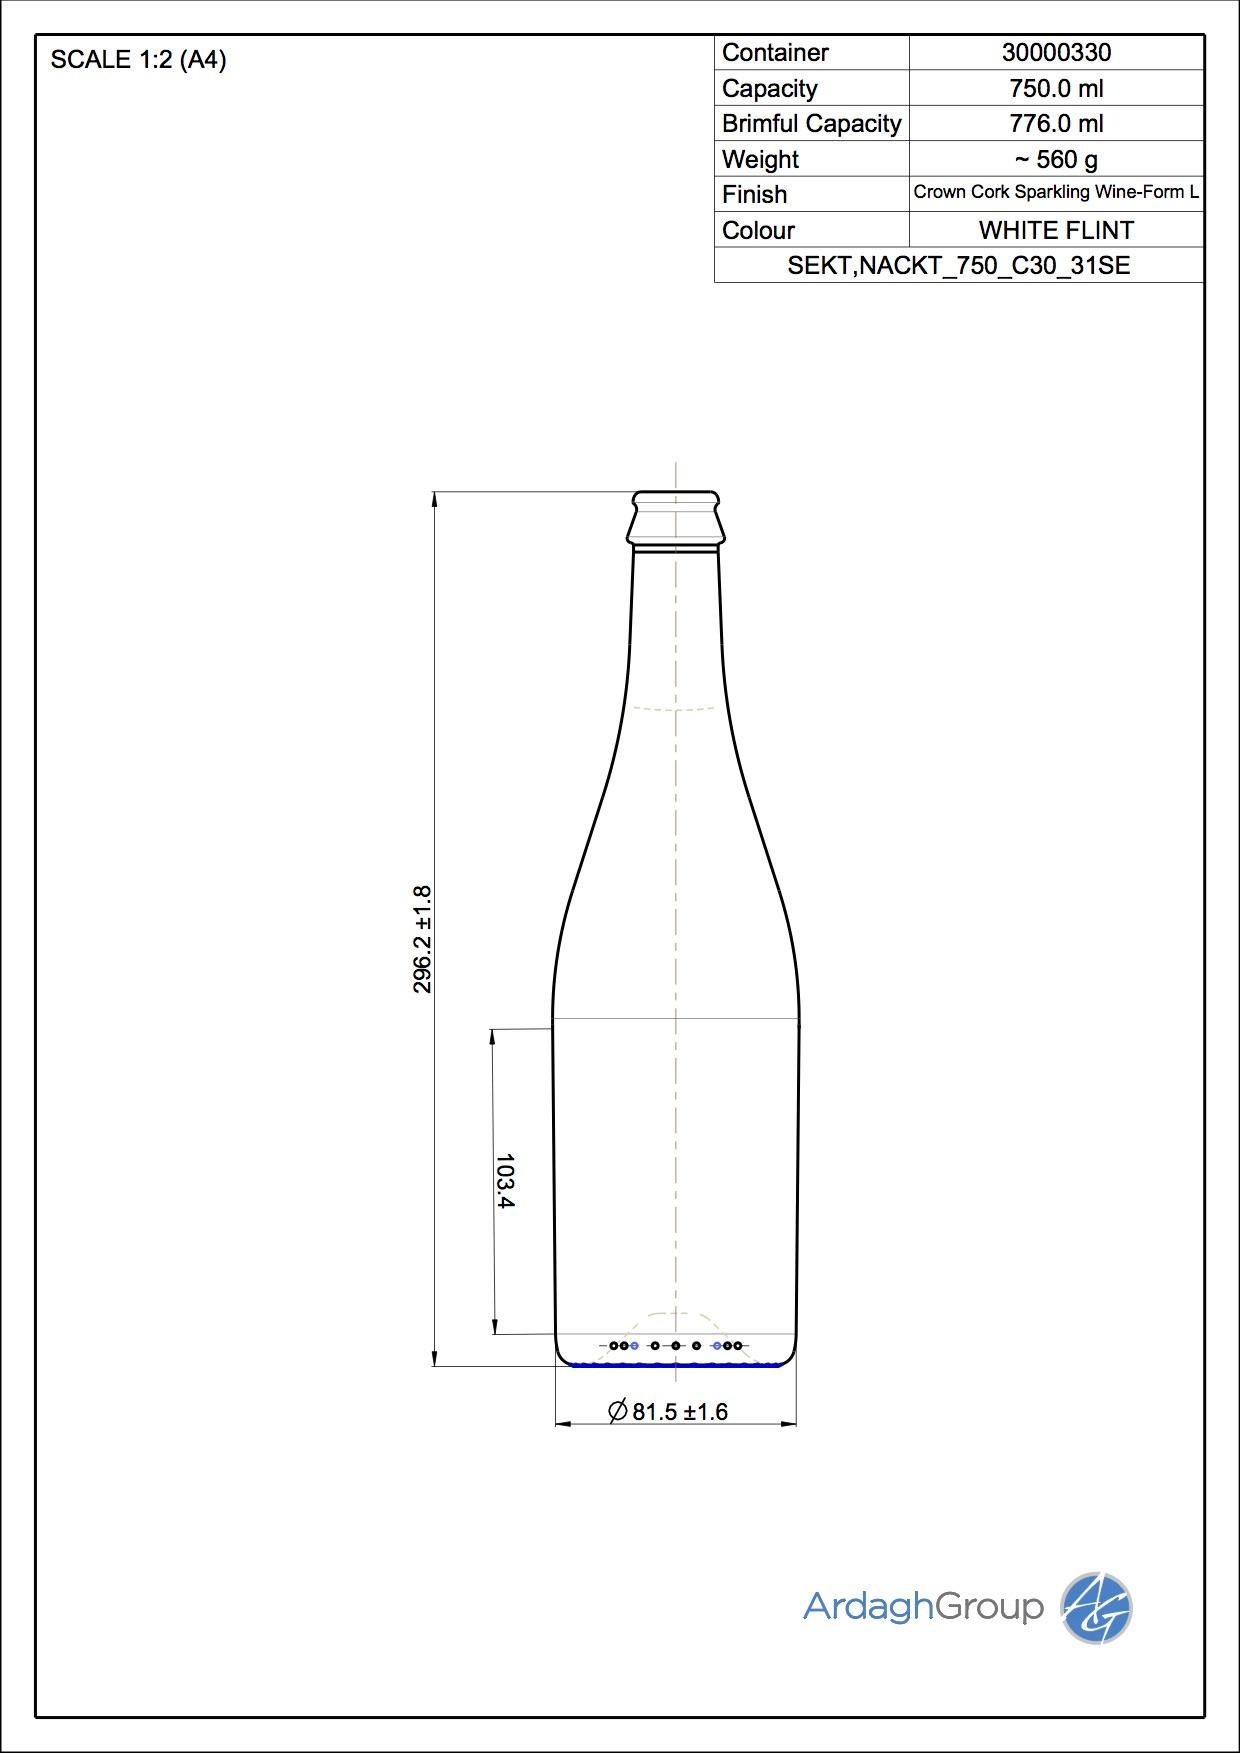 750ml flint glass Sekt Nackt oneway wine bottle